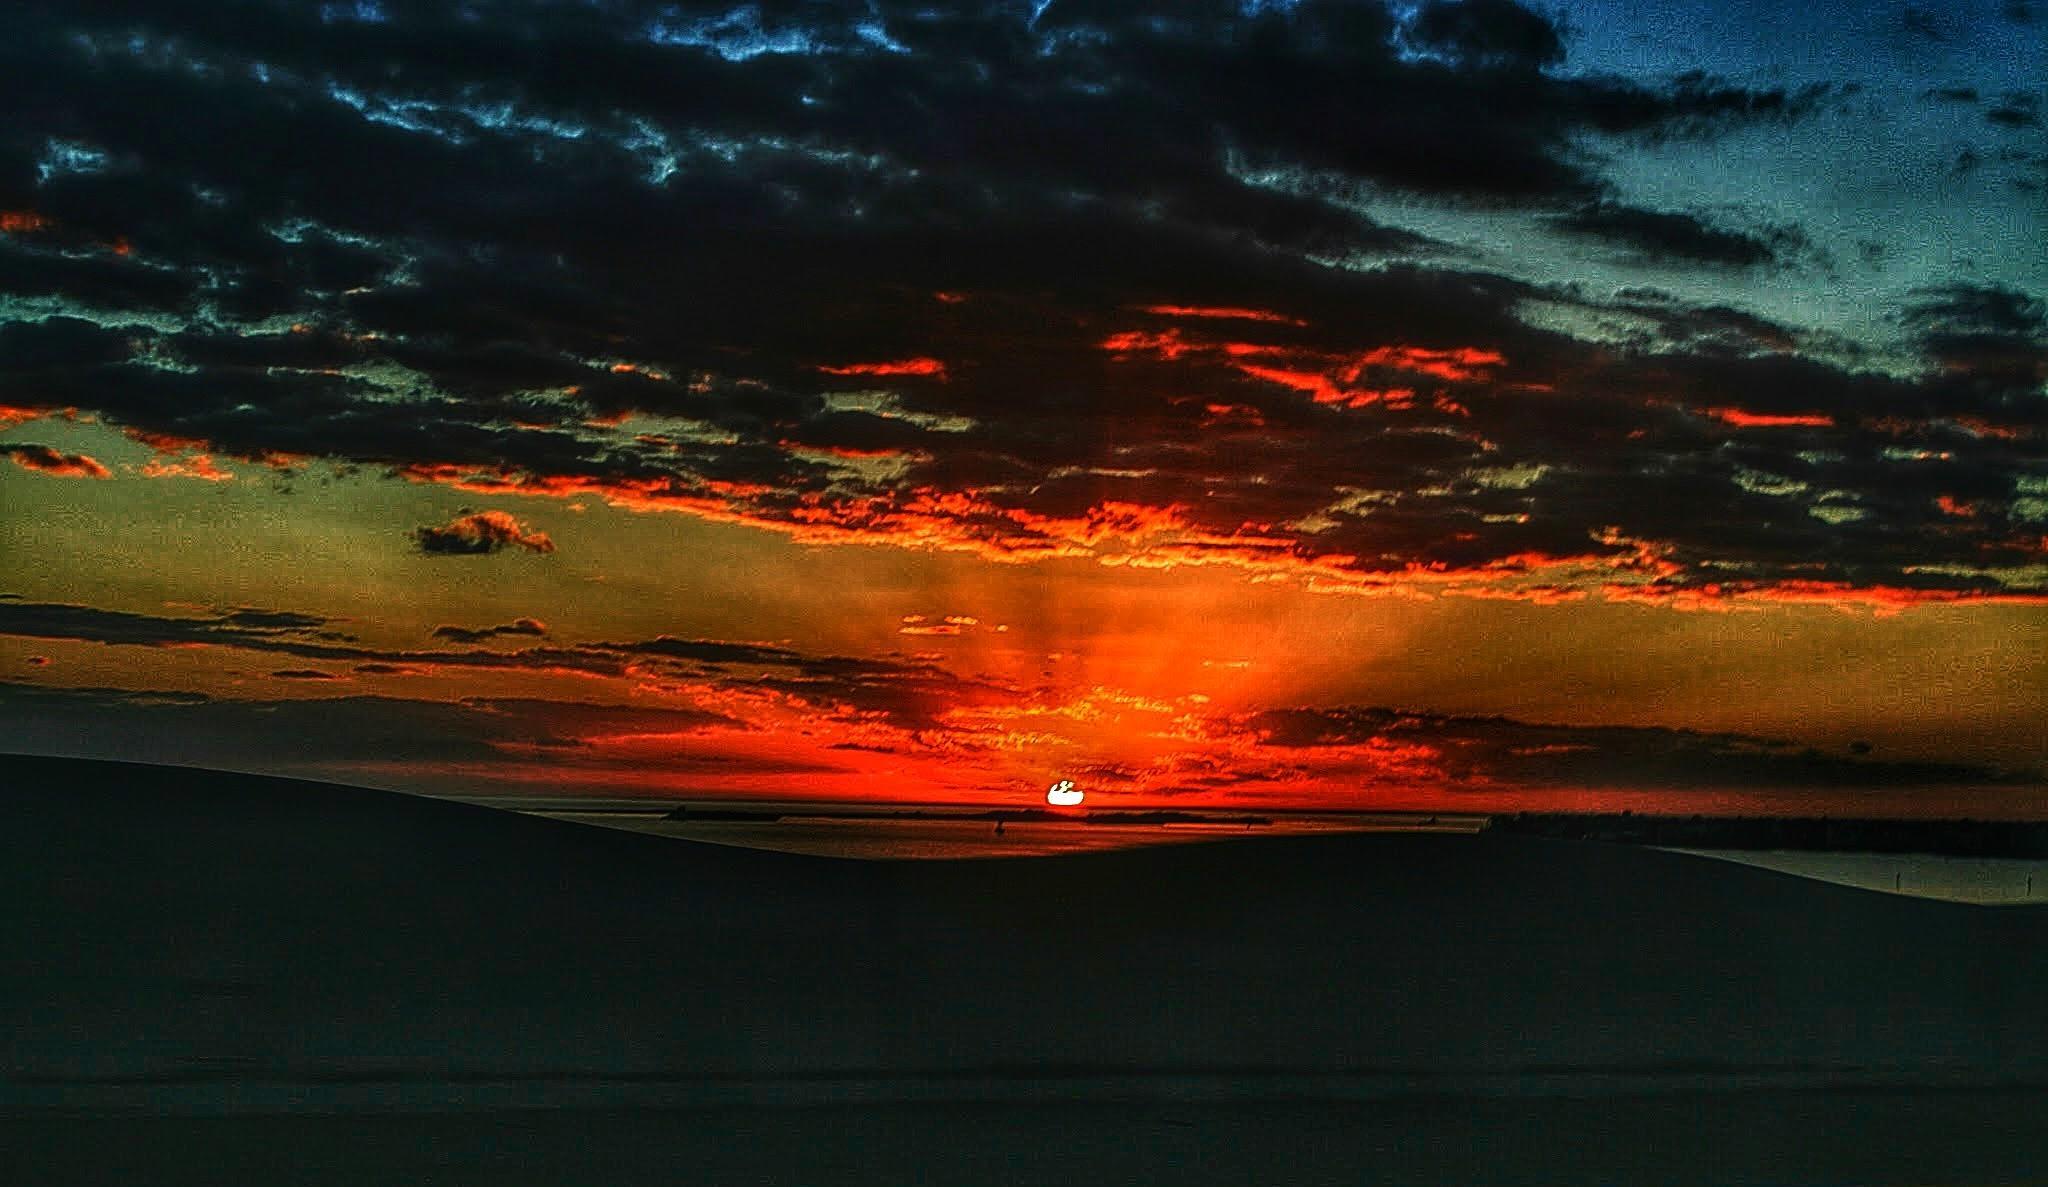 Causeway Sunset by drewk